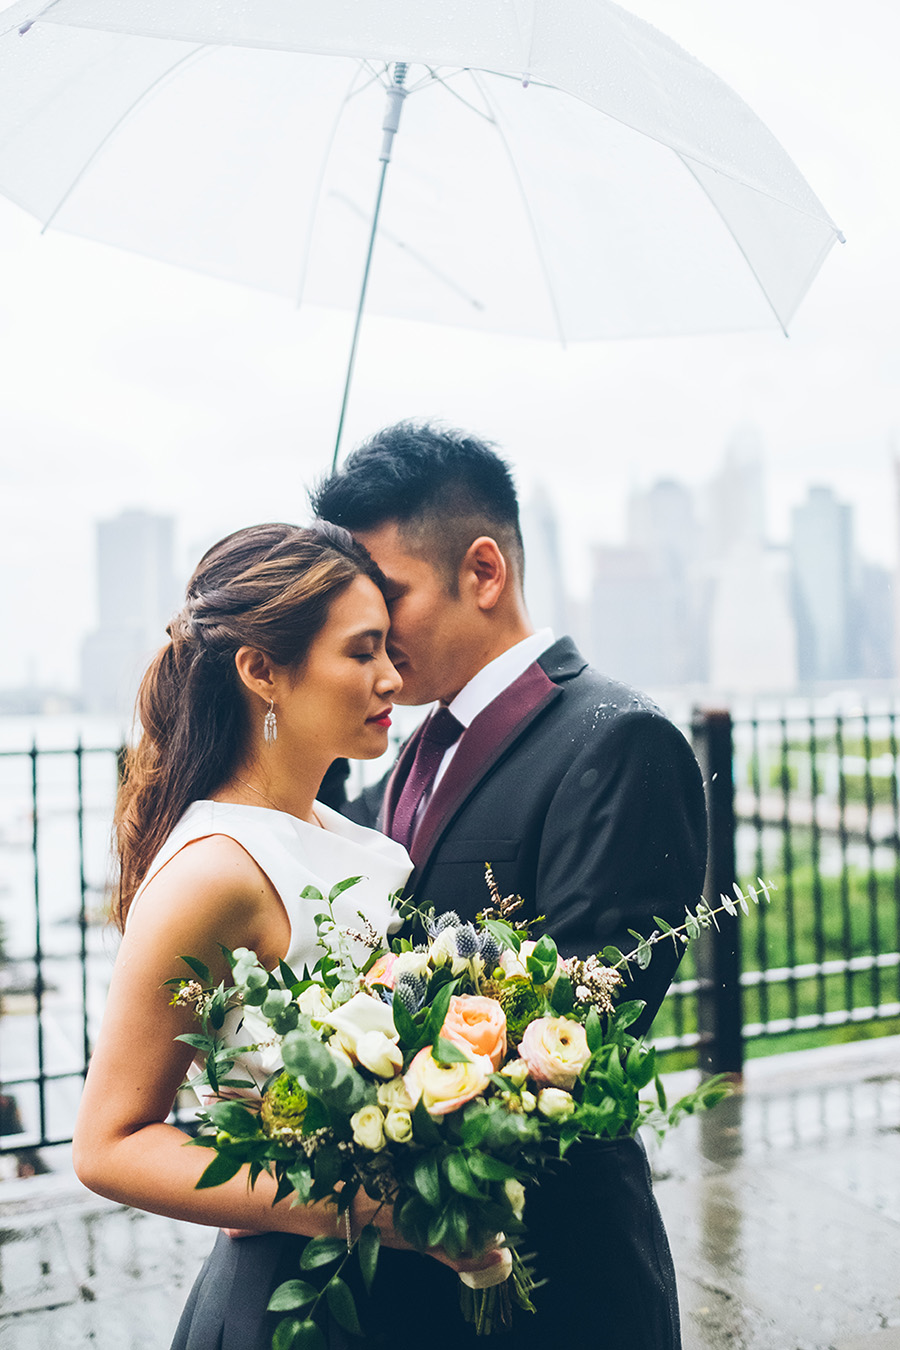 NEW-YORK-CITY-WEDDING-PHOTOGRAPHER-INTIMATE-WEDDING-ELOPEMENT-BROOKLYN-PROMENADE-CITYHALL-MANHATTAN-BROOKLYN-WEDDING-PHOTOGRAPHY-JackieAaron-0030.jpg